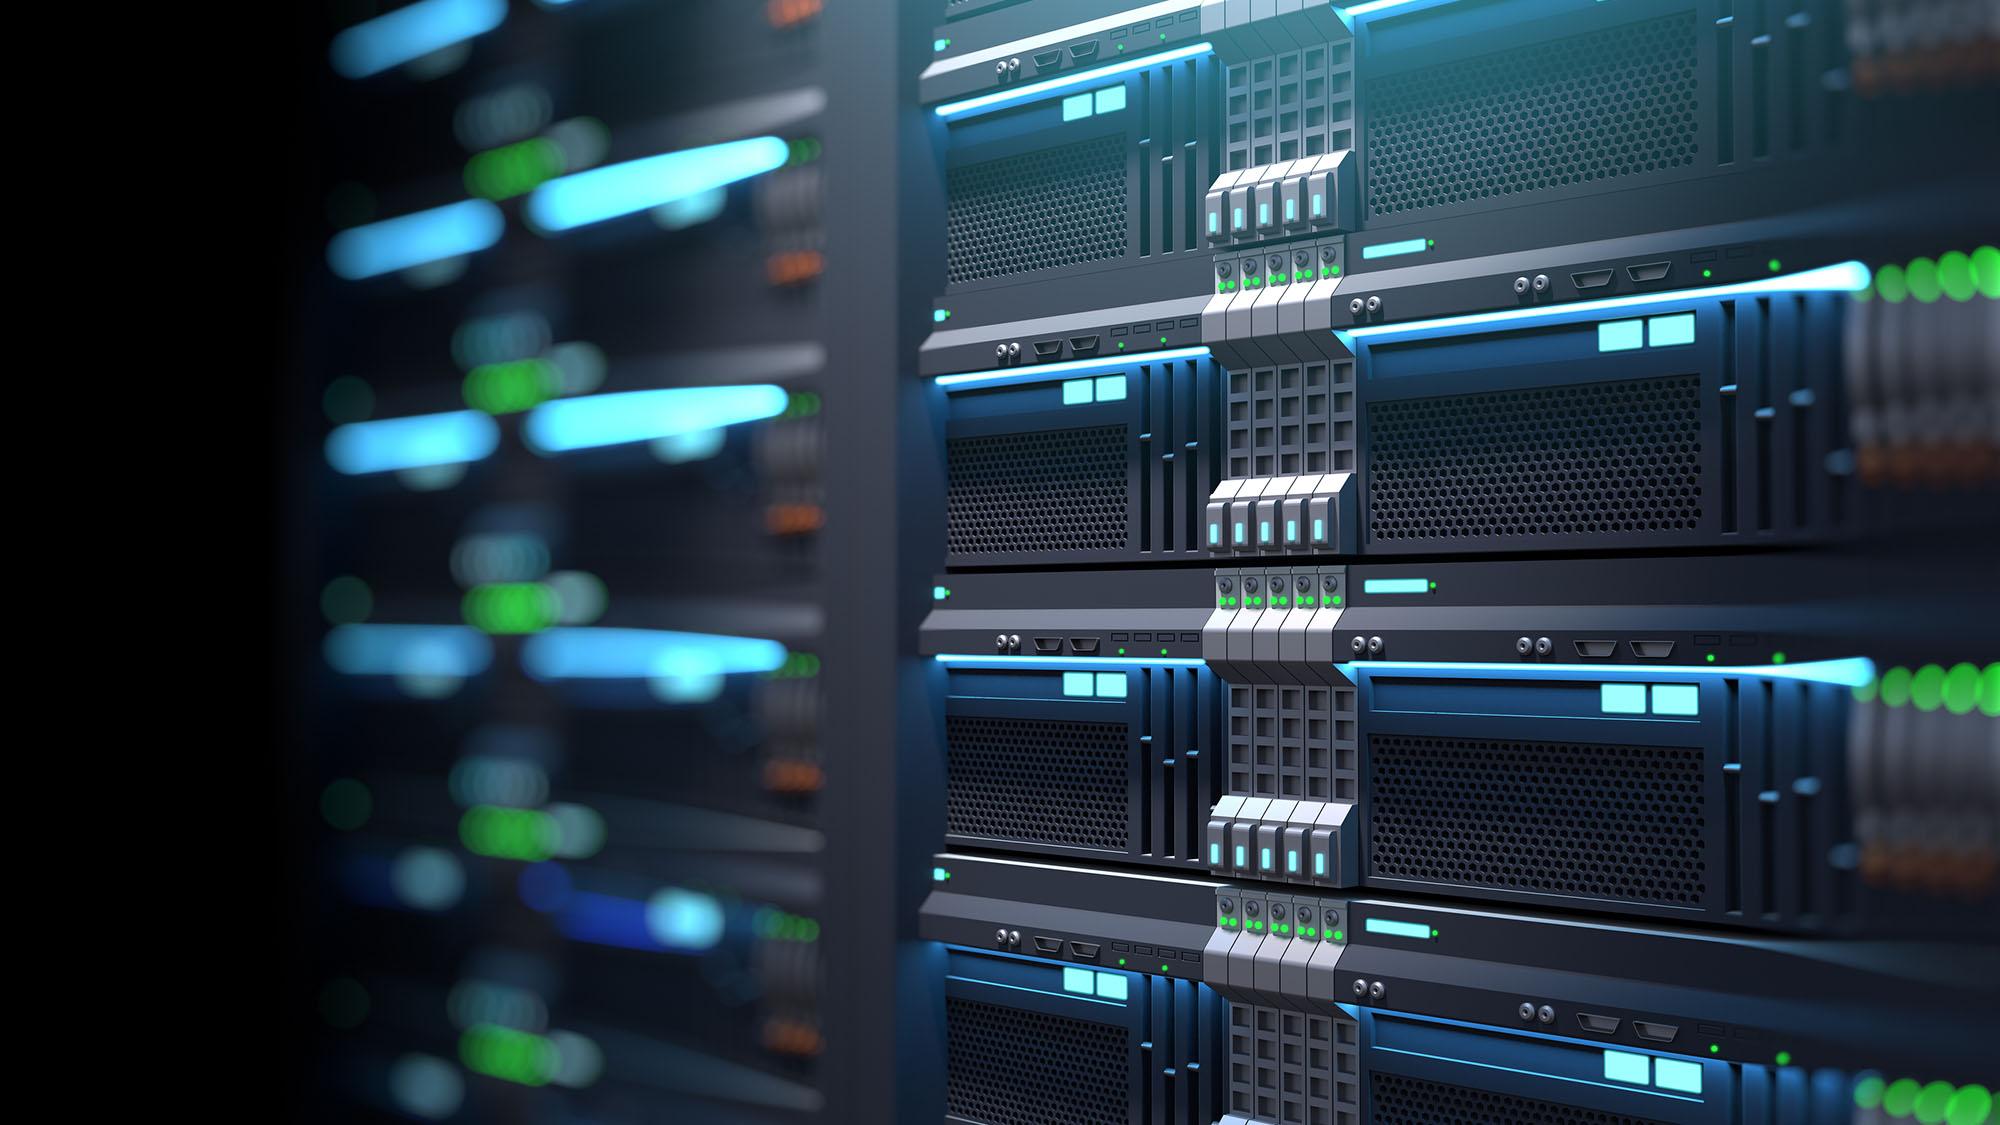 Super computer server racks